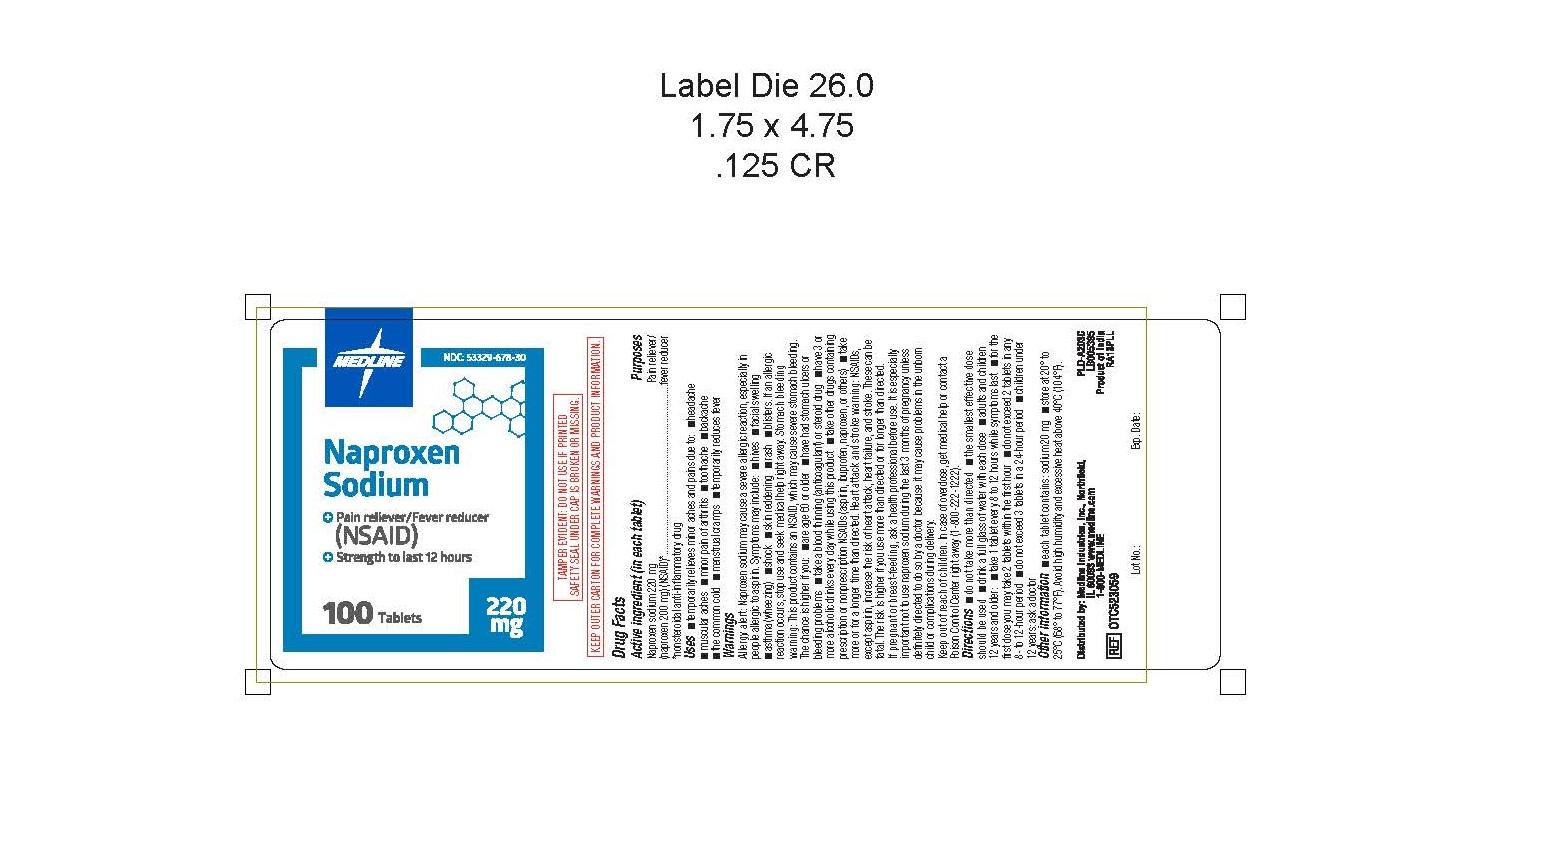 Immediate product label